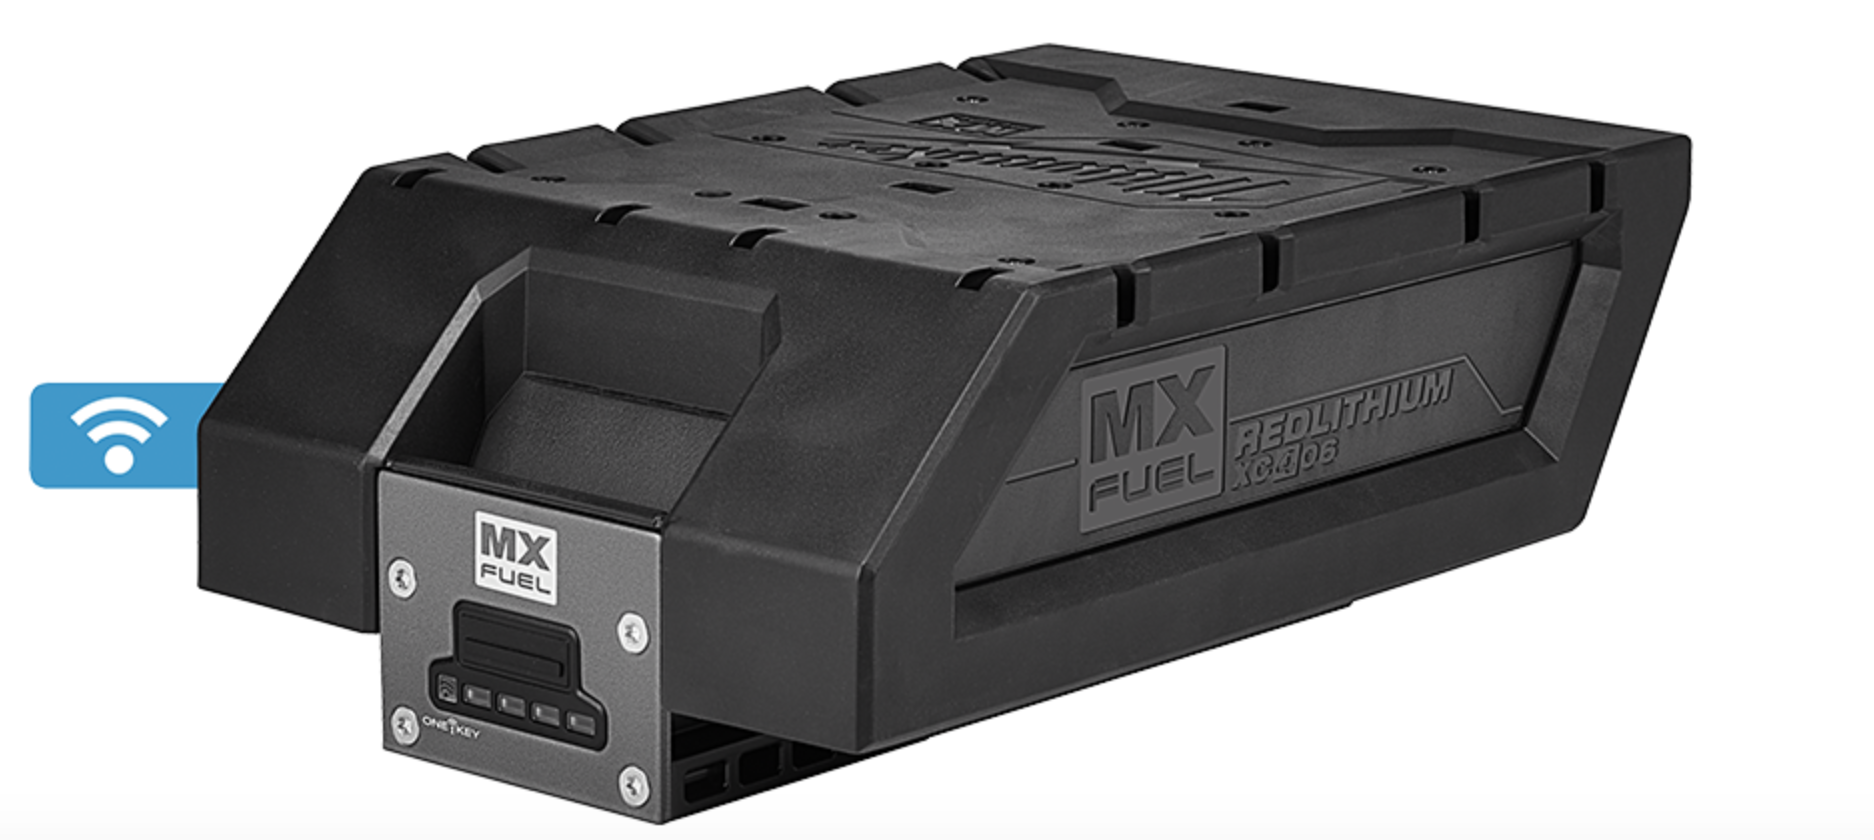 Milwaukee MX Fuel XC 406 battery